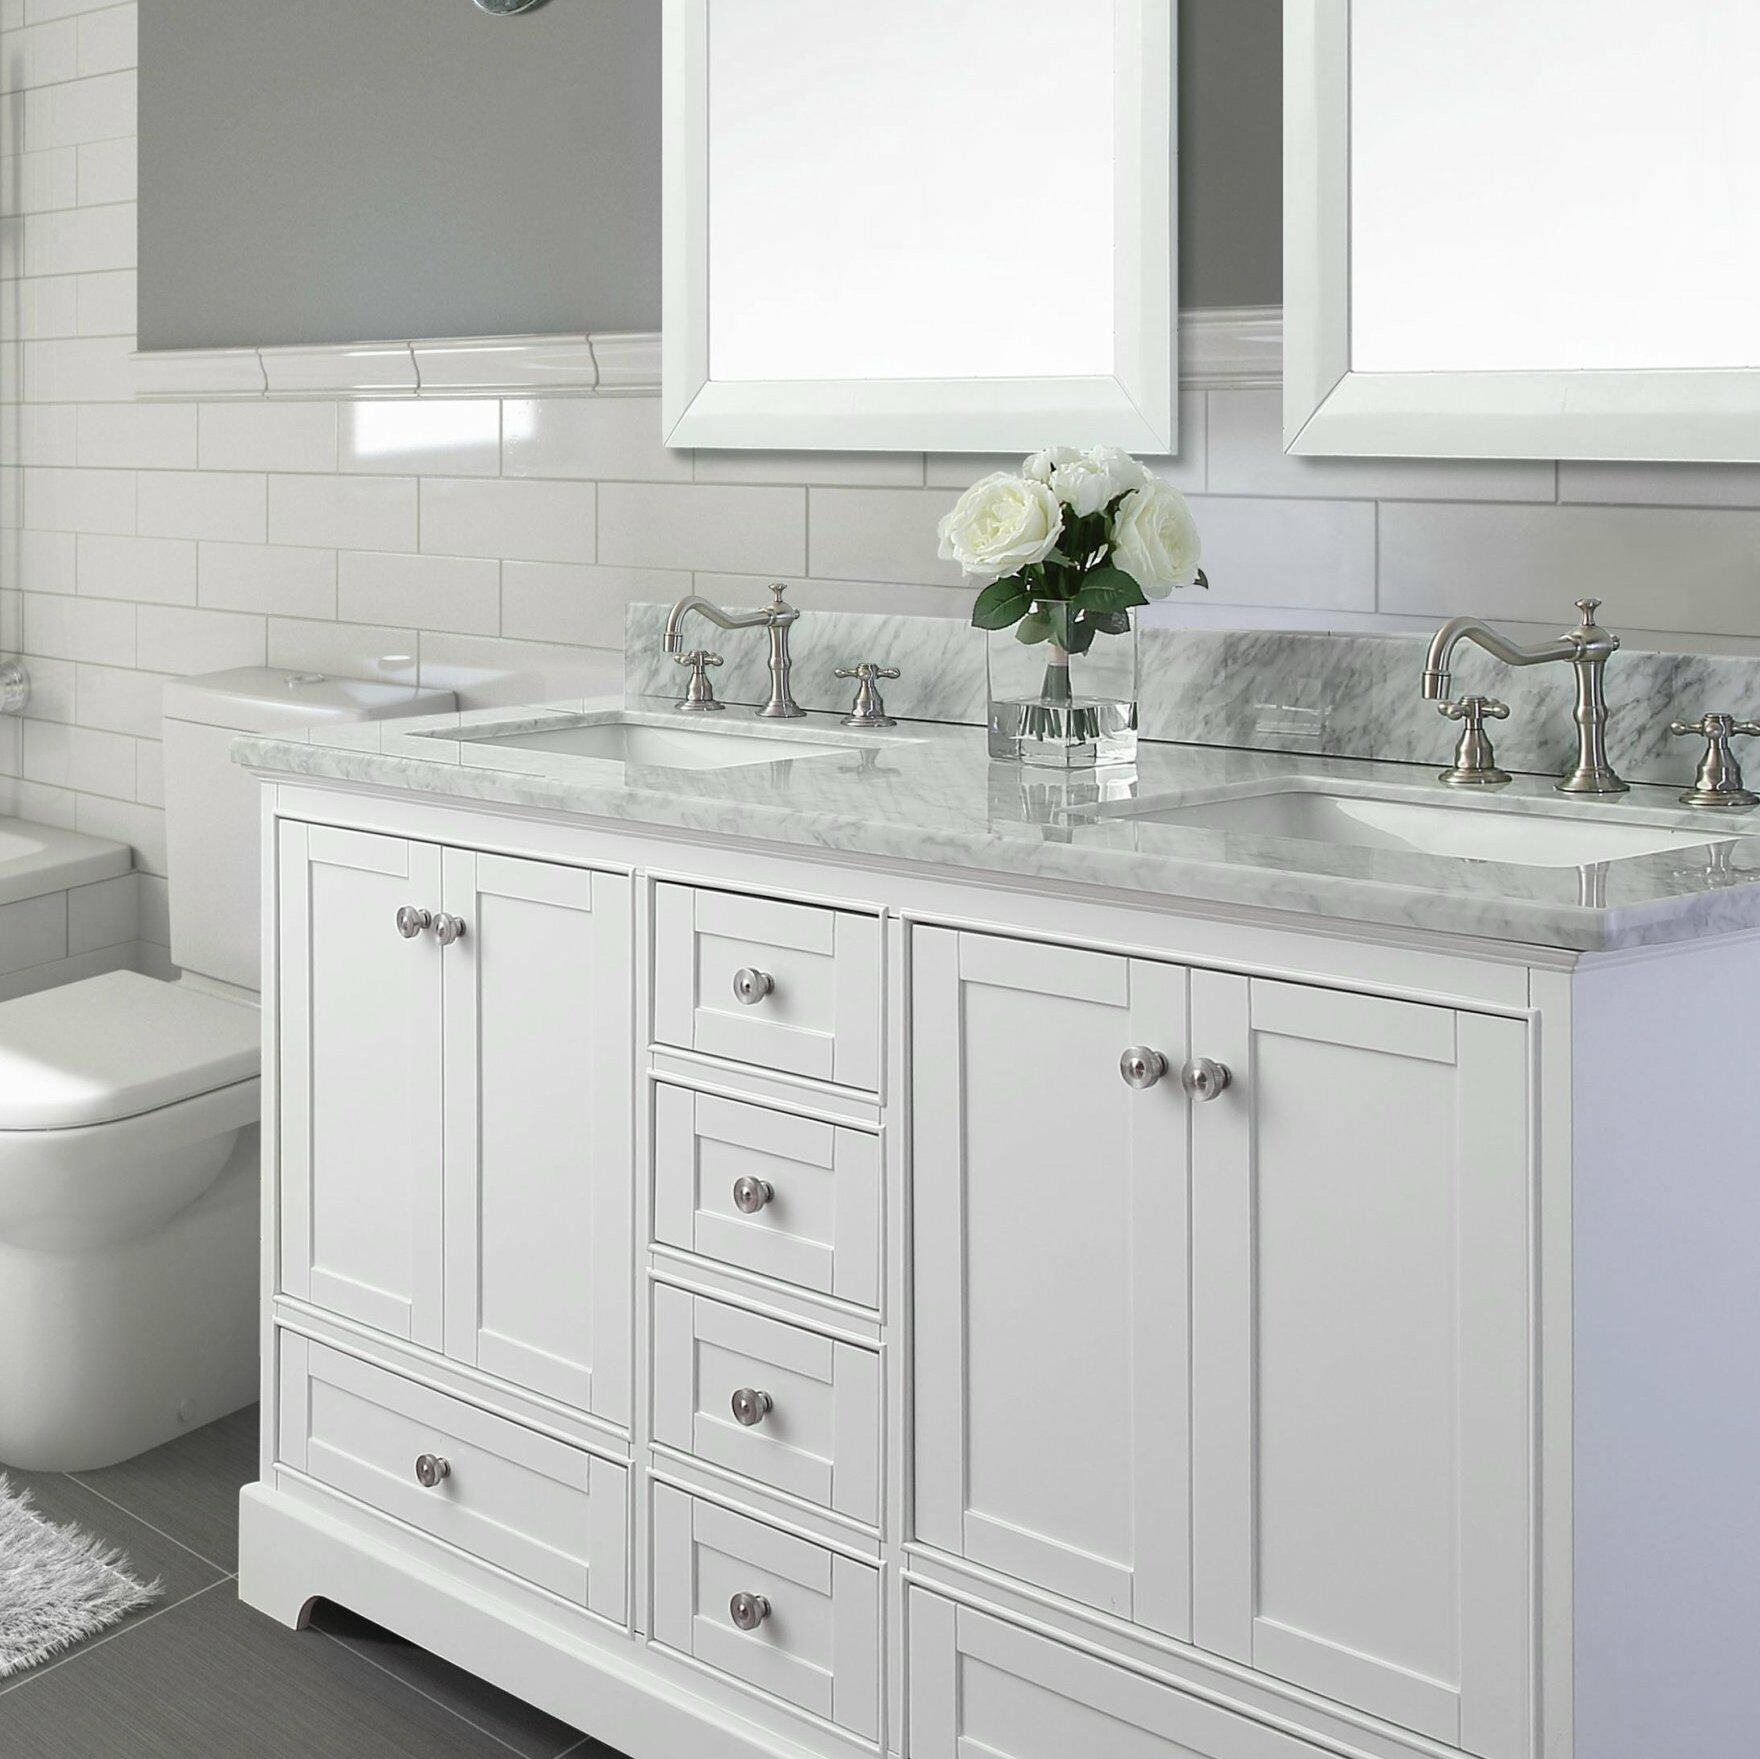 Birch Lane 72 Double Bathroom Vanity Set With Italian Carrara White Marble Top Reviews Wayfair